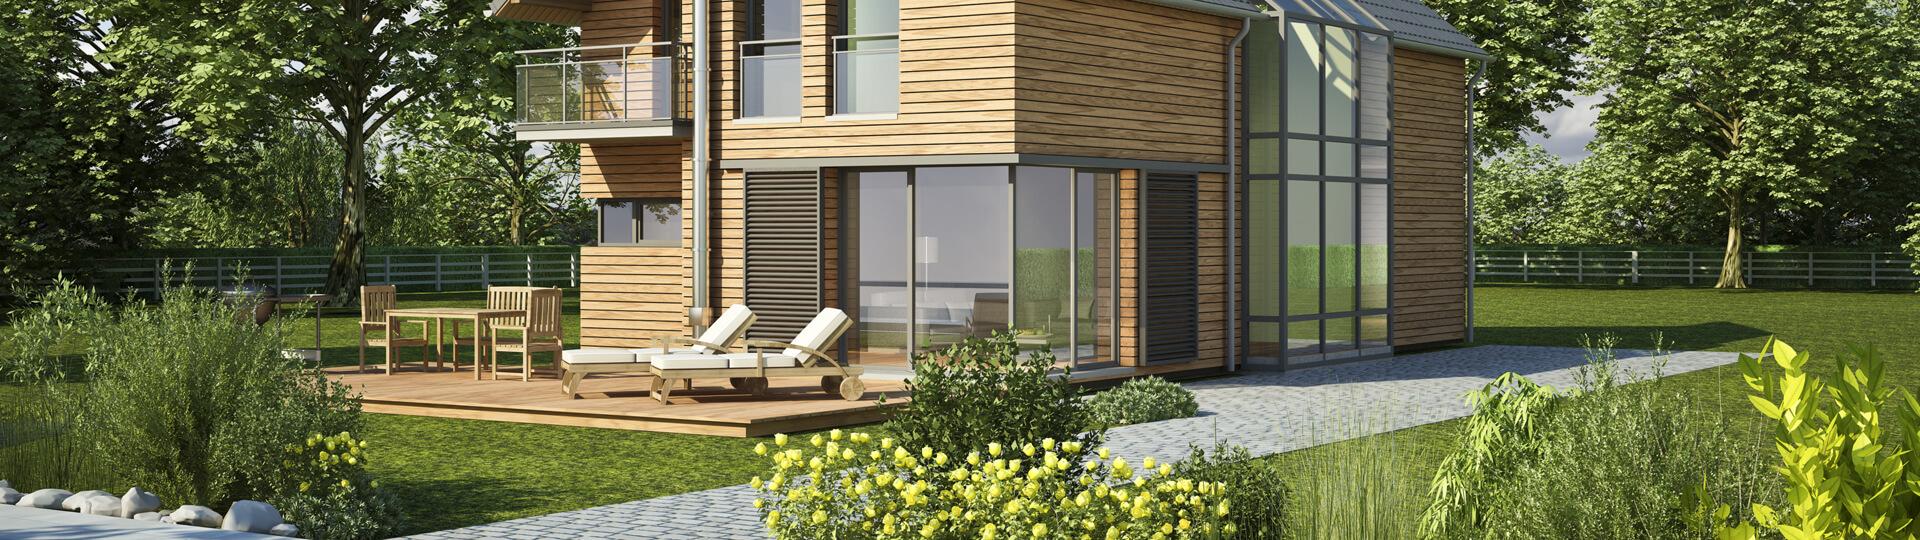 wohngesundheit. Black Bedroom Furniture Sets. Home Design Ideas